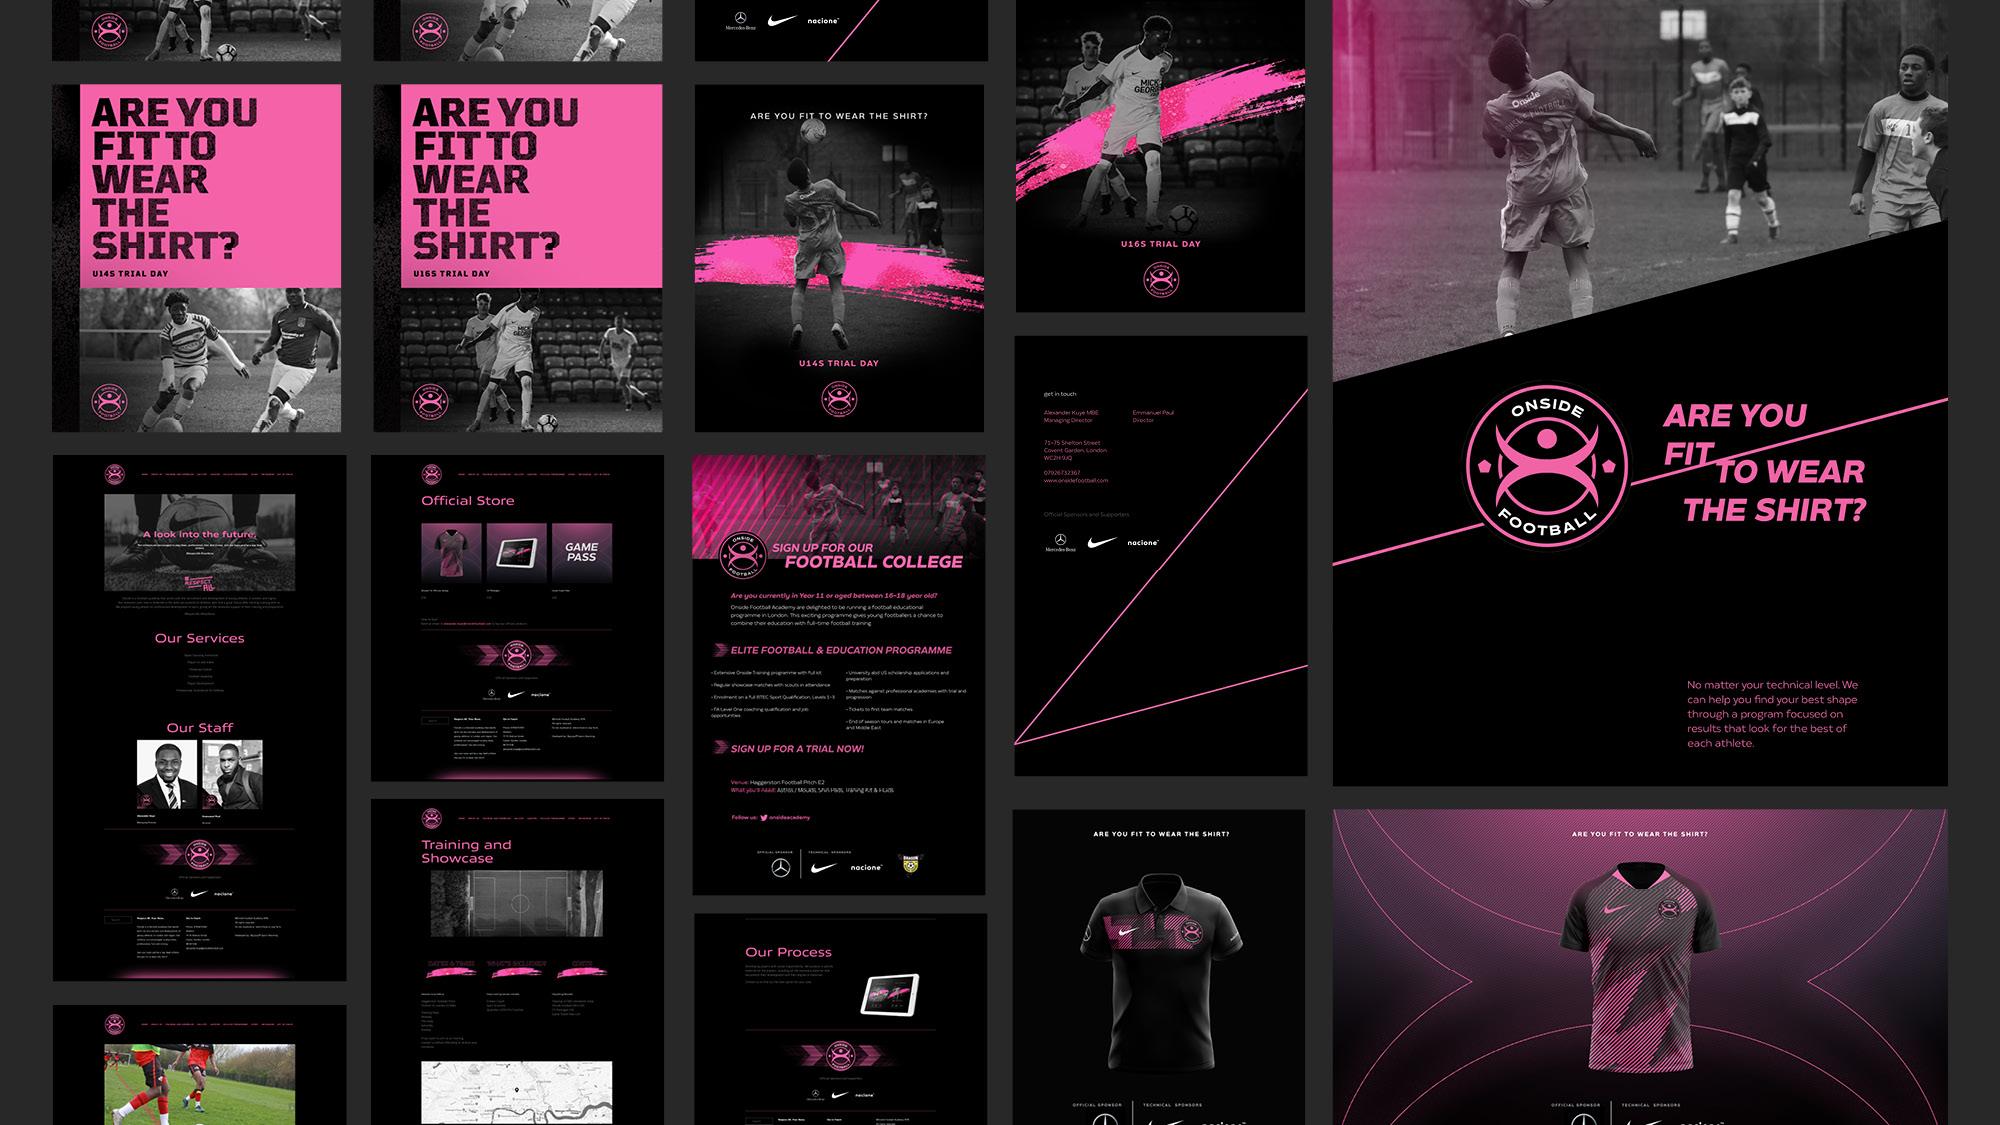 201906-Nacione-Branding-Onside-Football-Academy9